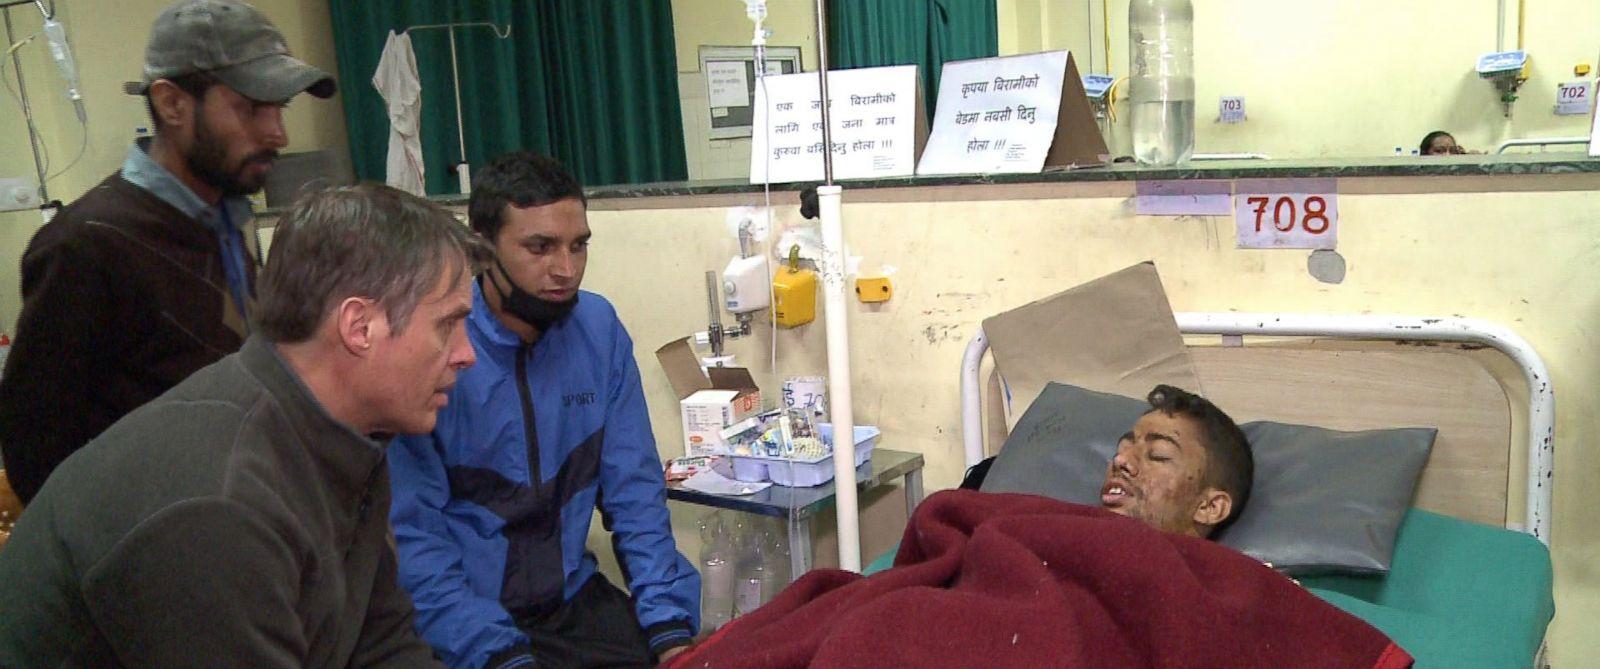 ABCs Terry Moran speaks with an earthquake survivor in Kathmandu, Nepal.